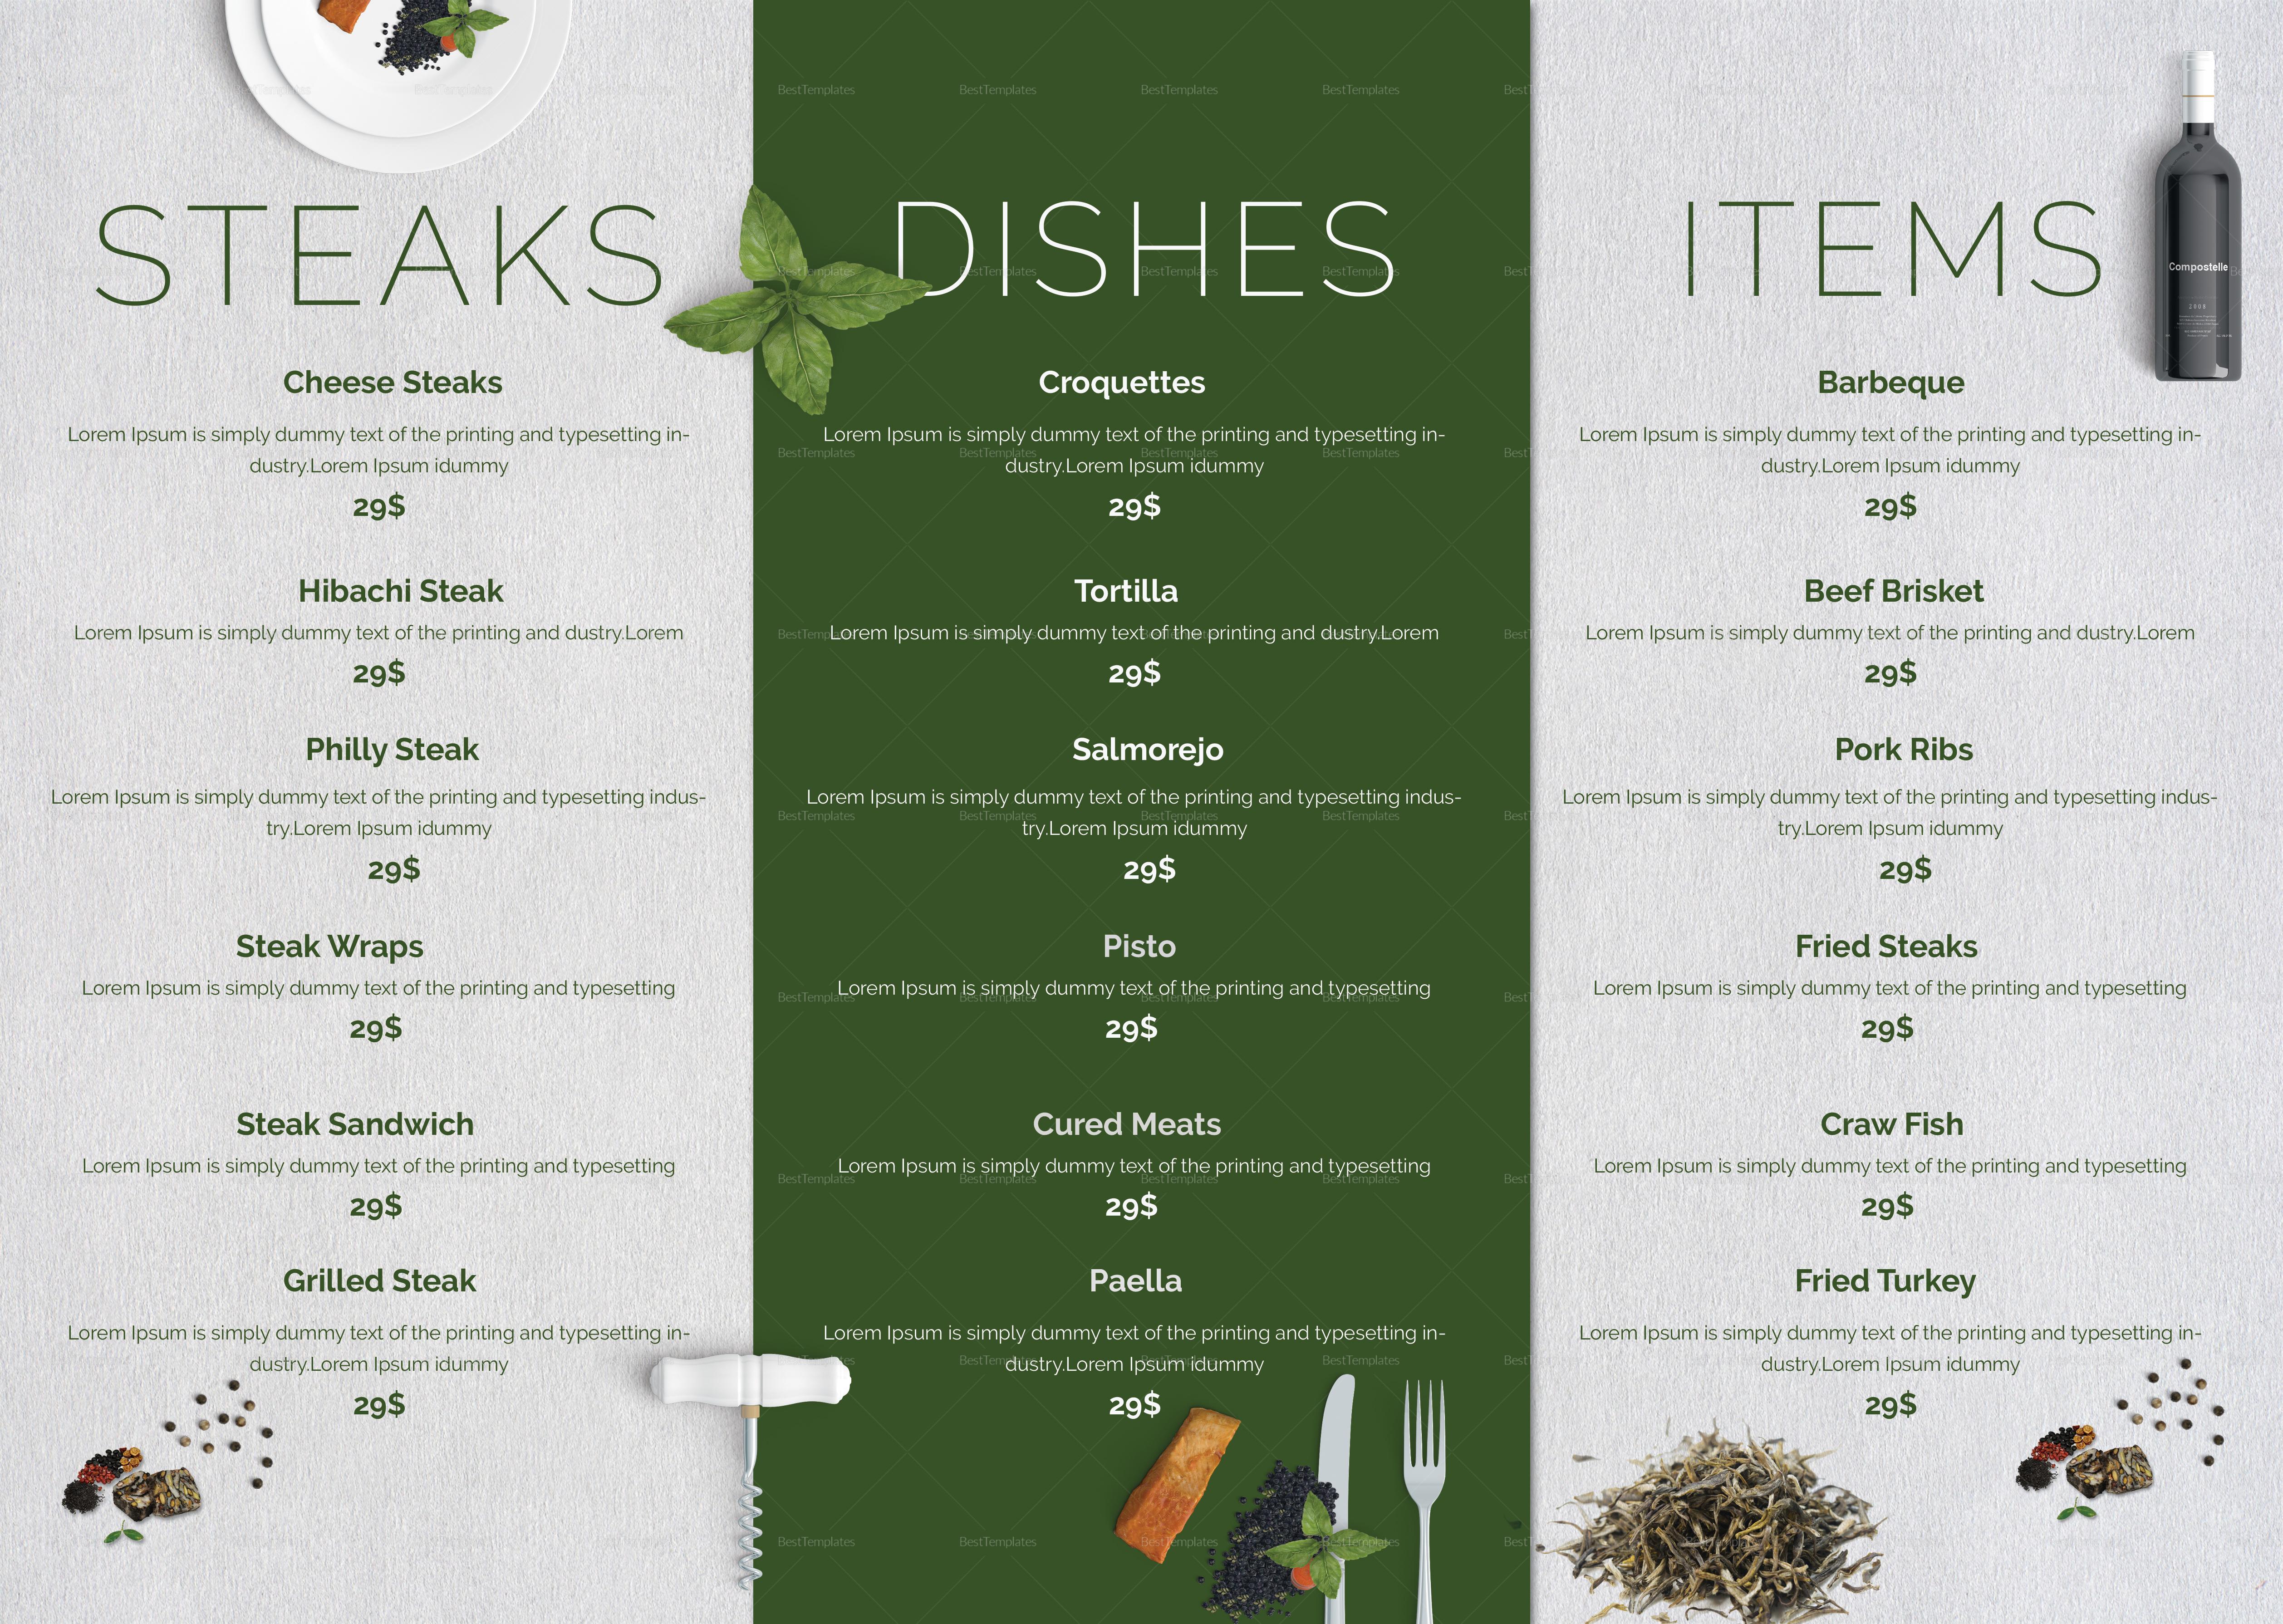 mc cafe menu design template in psd word publisher